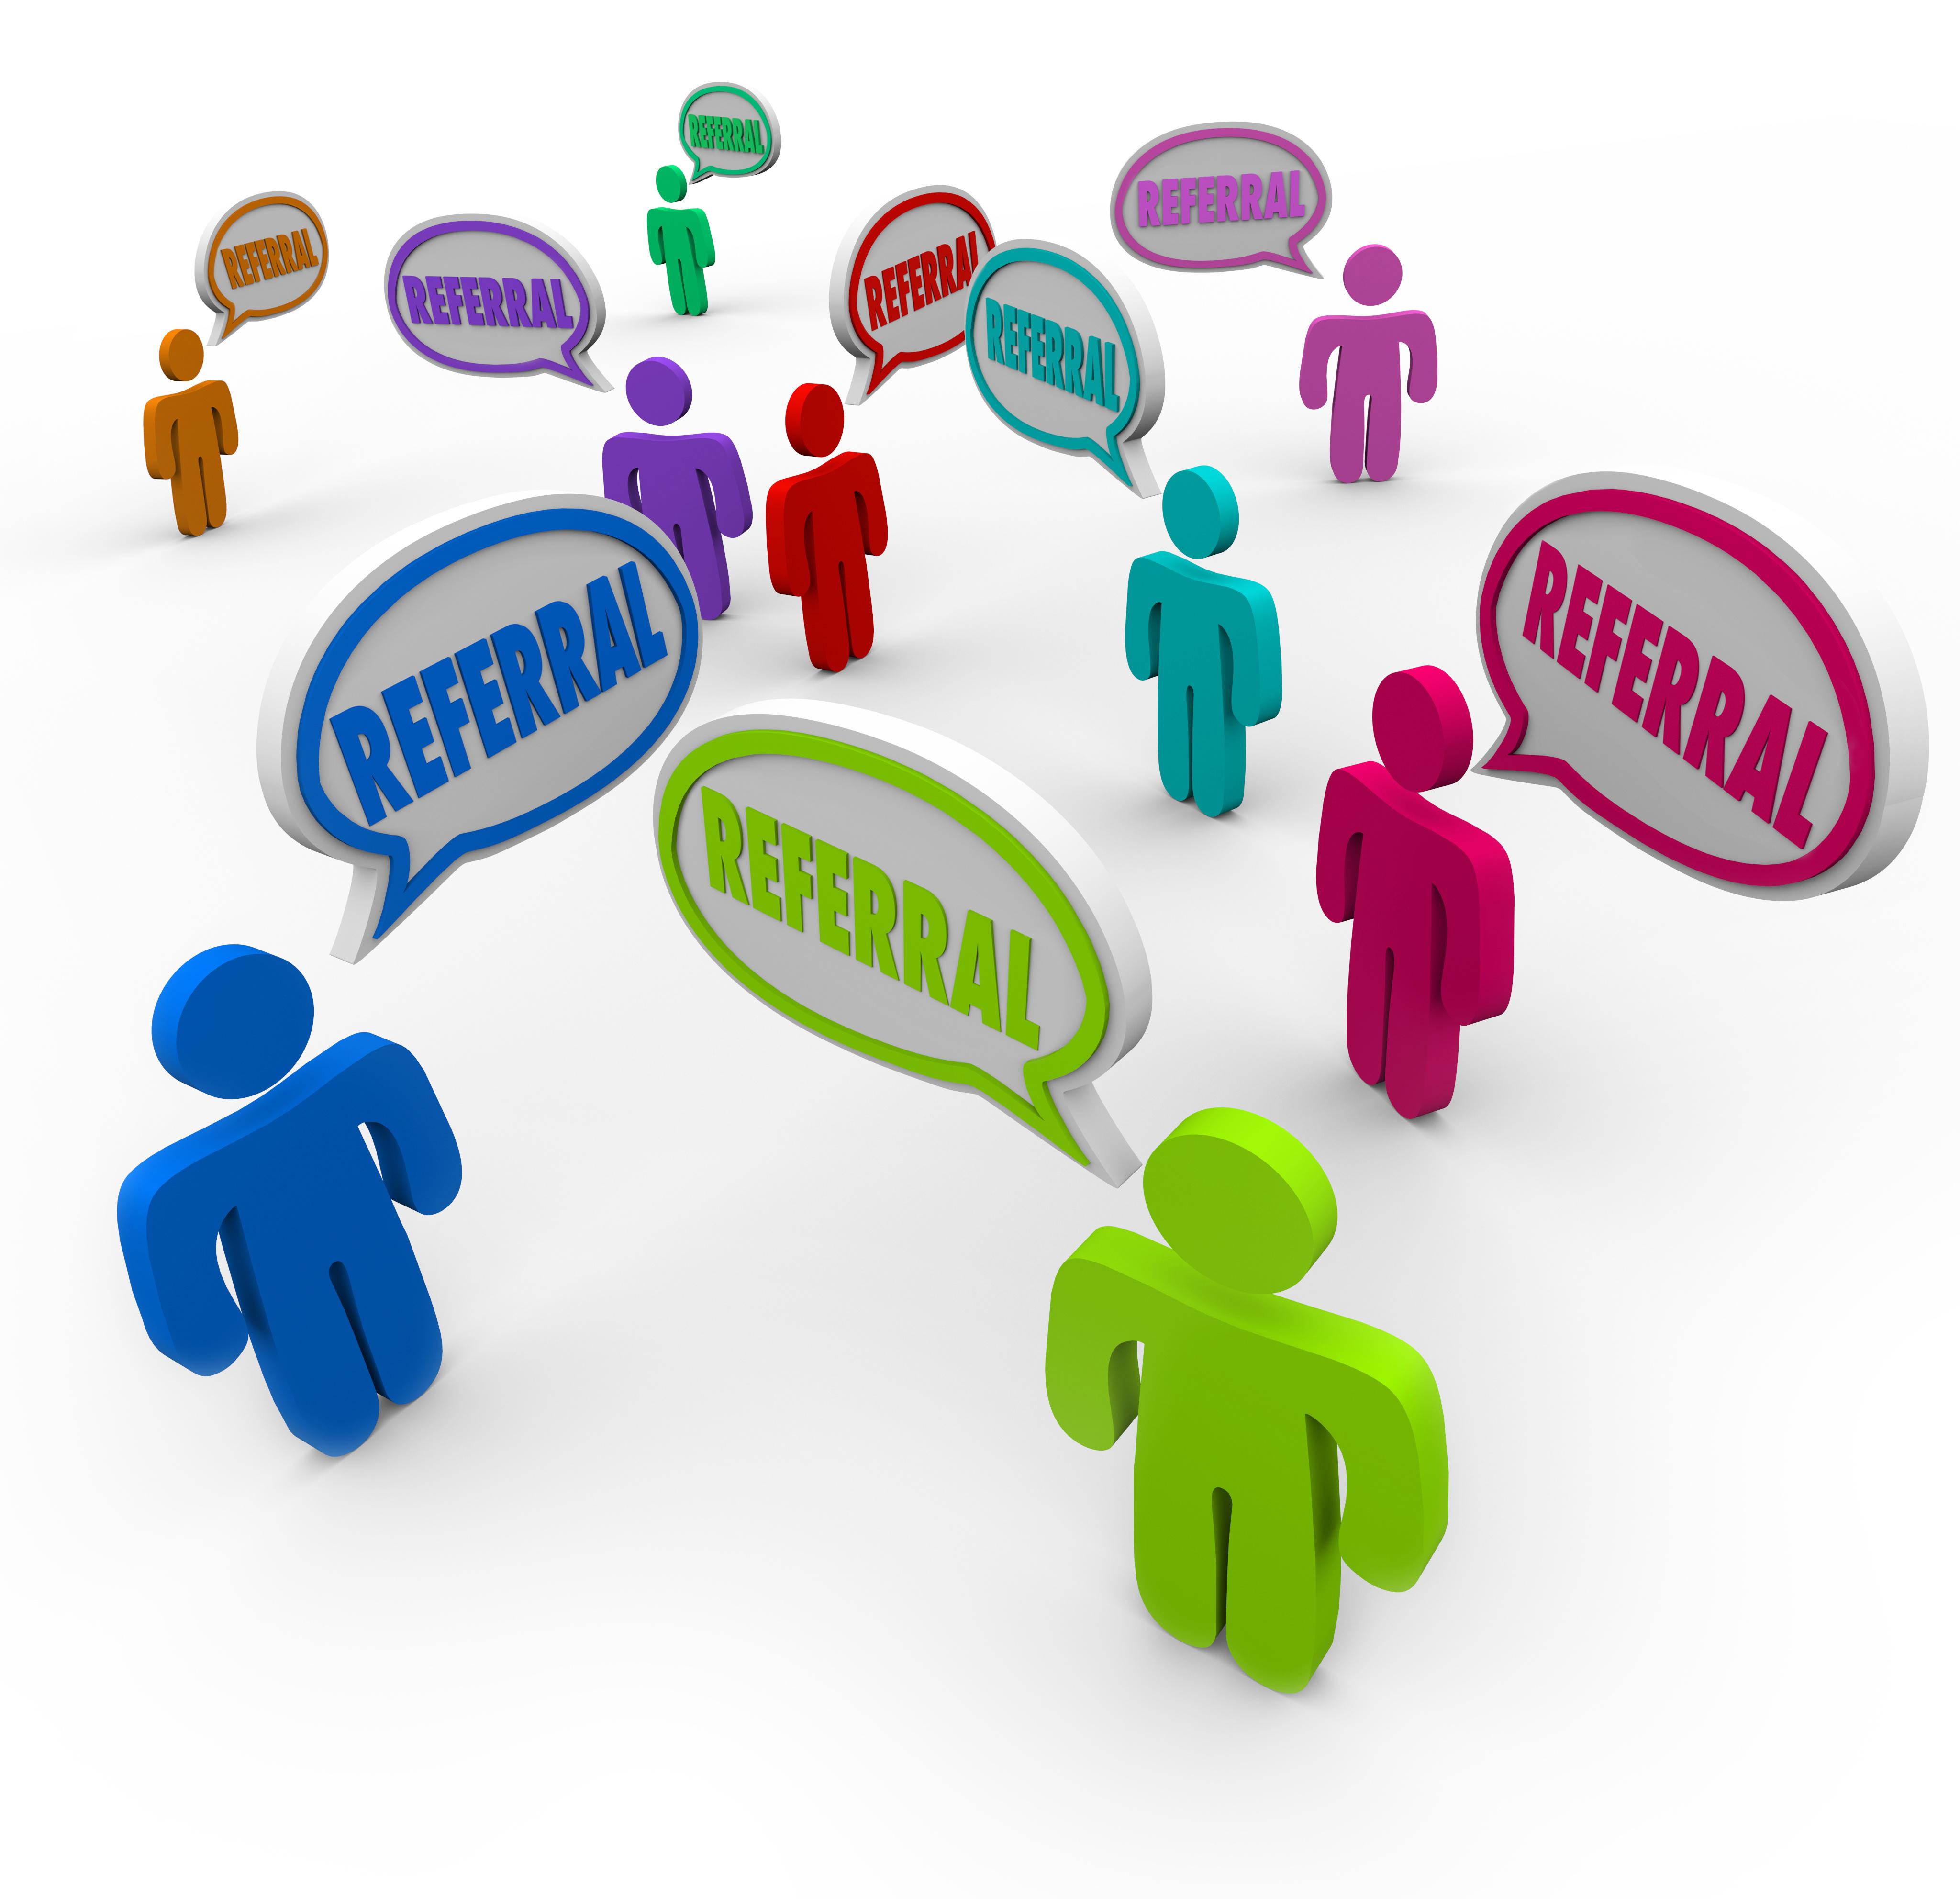 What is Viral Referral Marketing? | Devin Dorosh